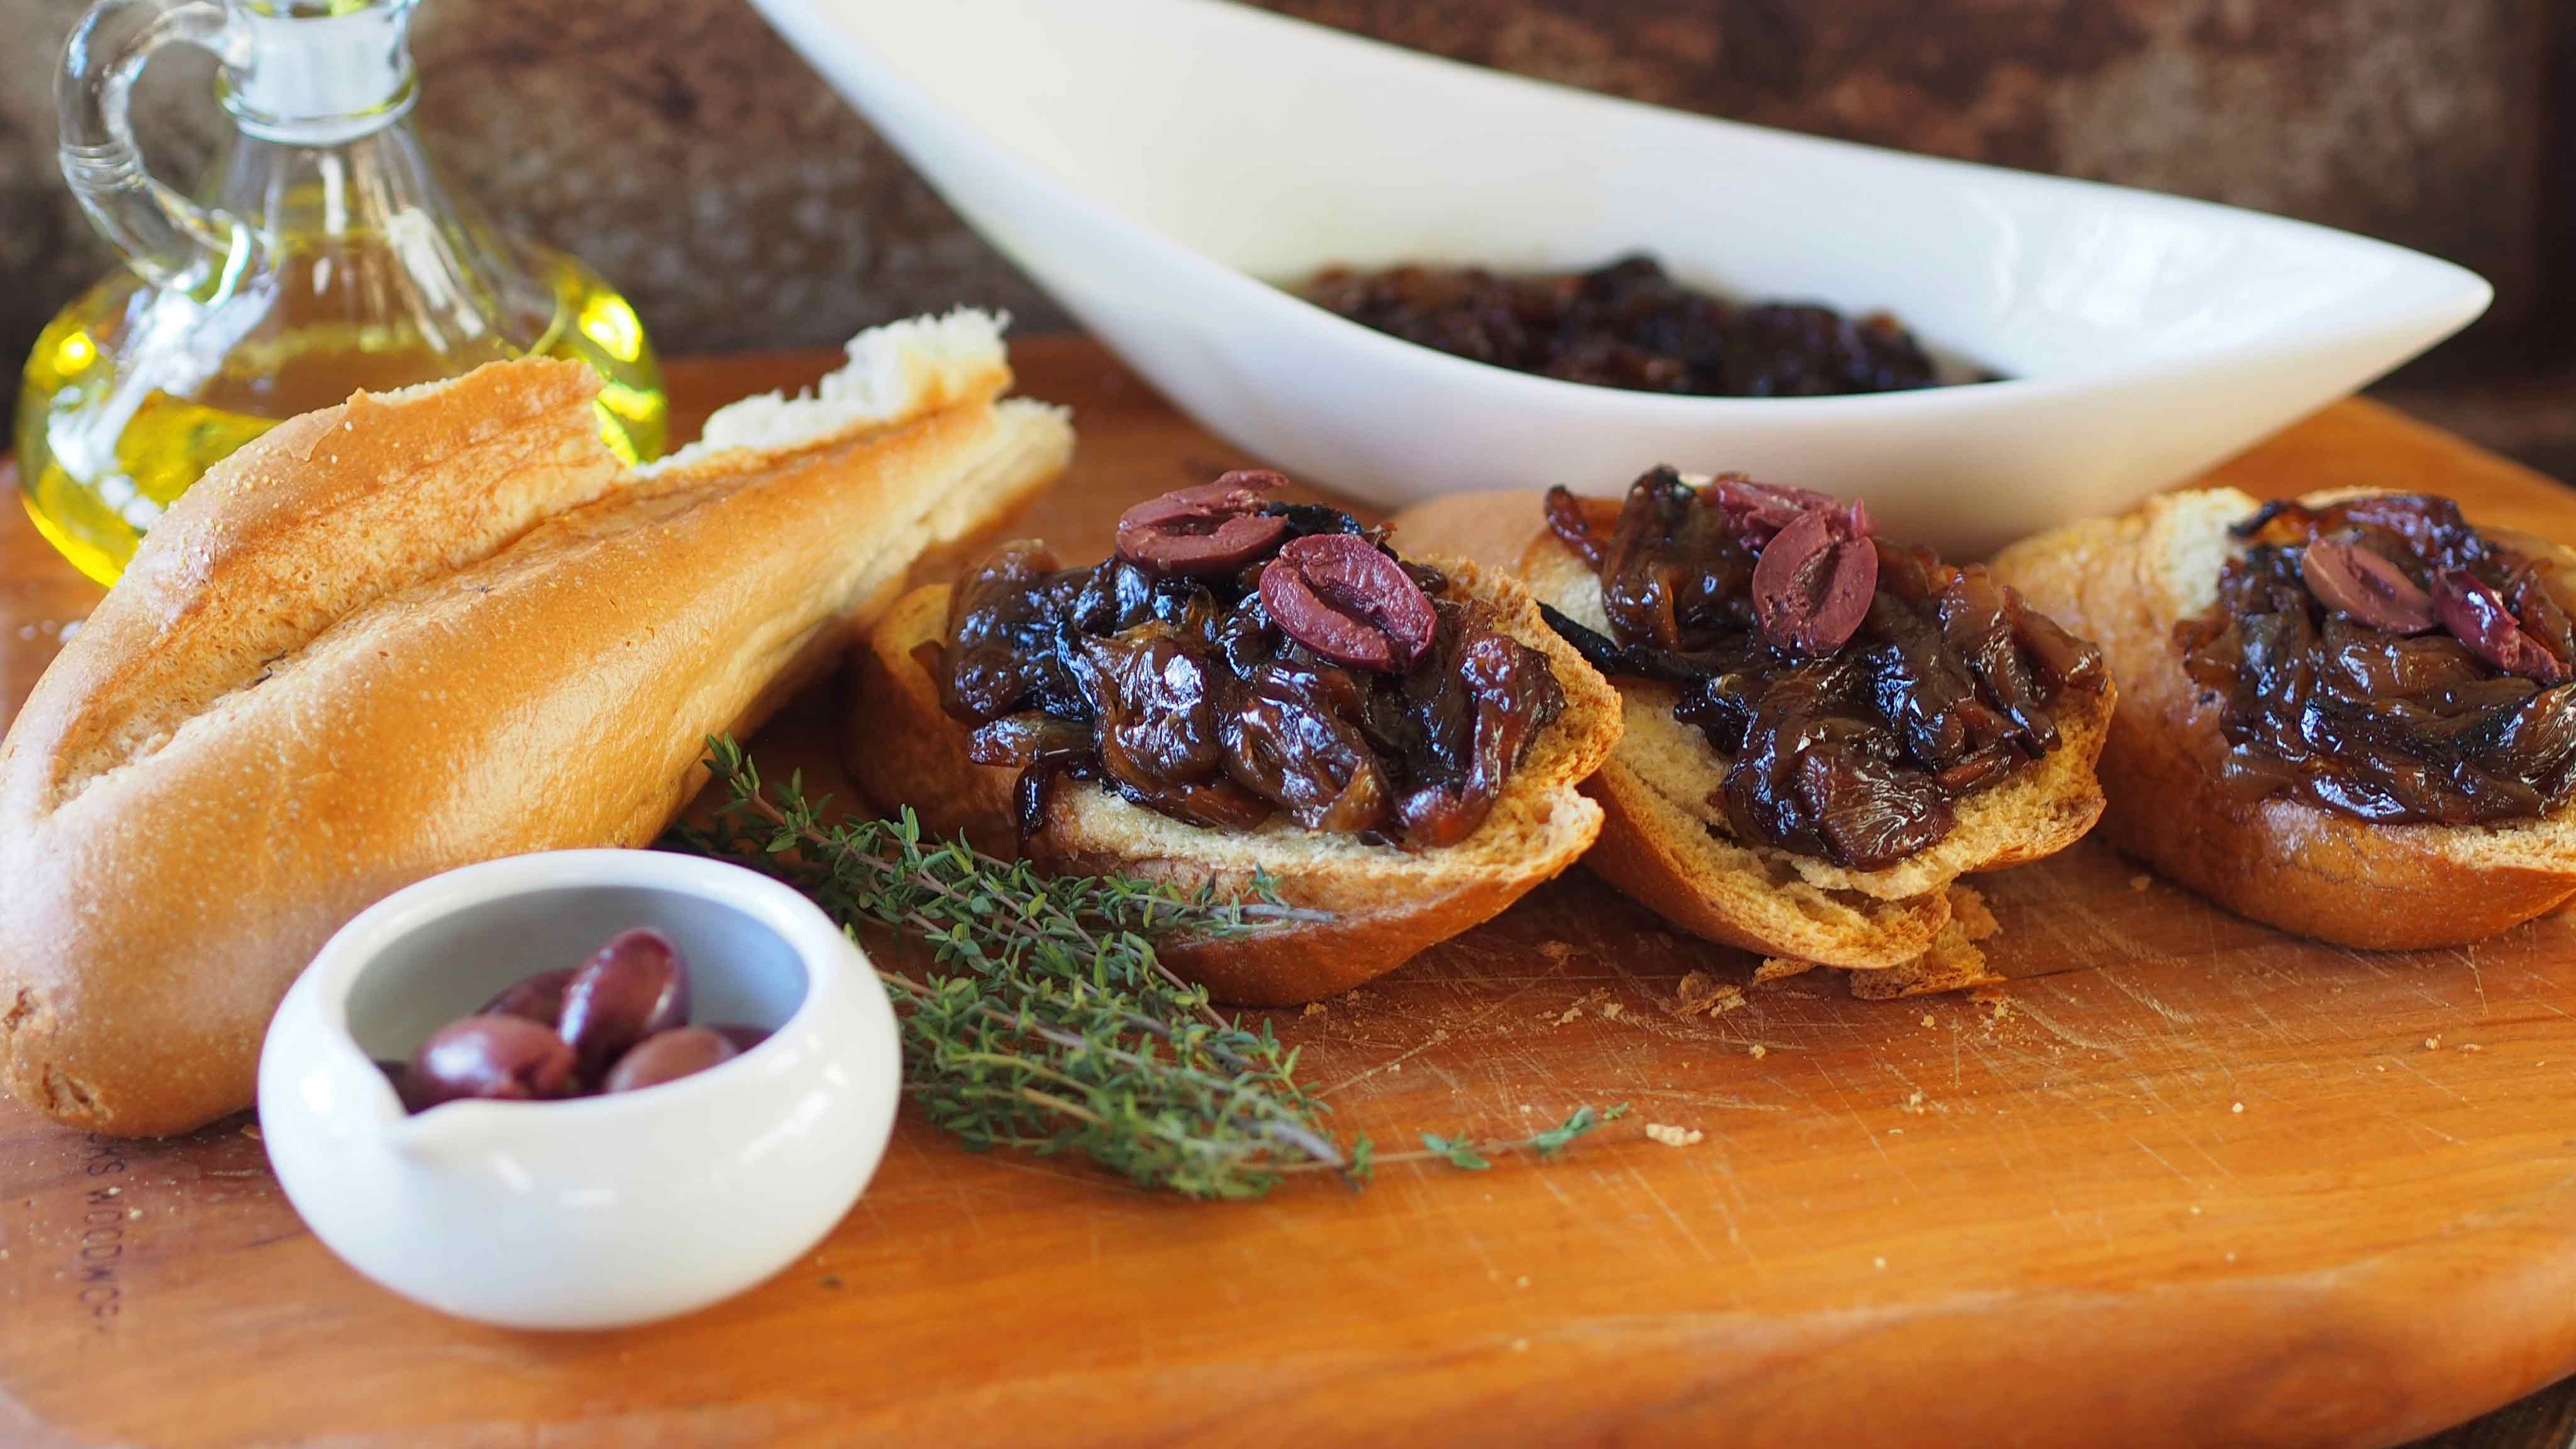 Image for Recipe Caramelized Onion Bruschetta